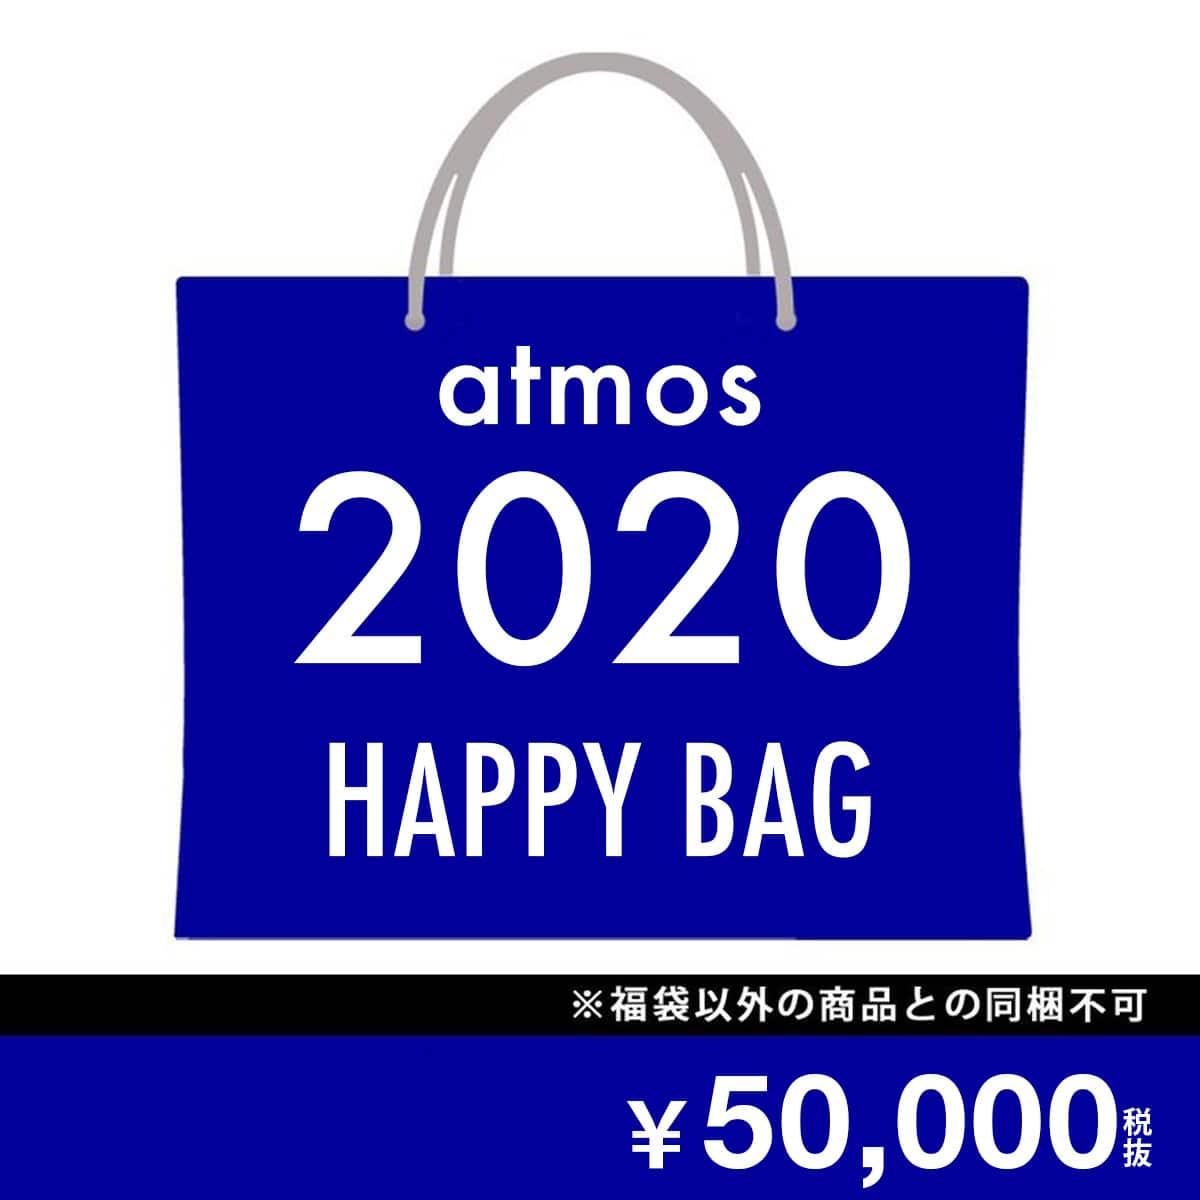 atmos 【2020年福袋】 HAPPY BAG 五万円 (MENS) 20SP-S_photo_large